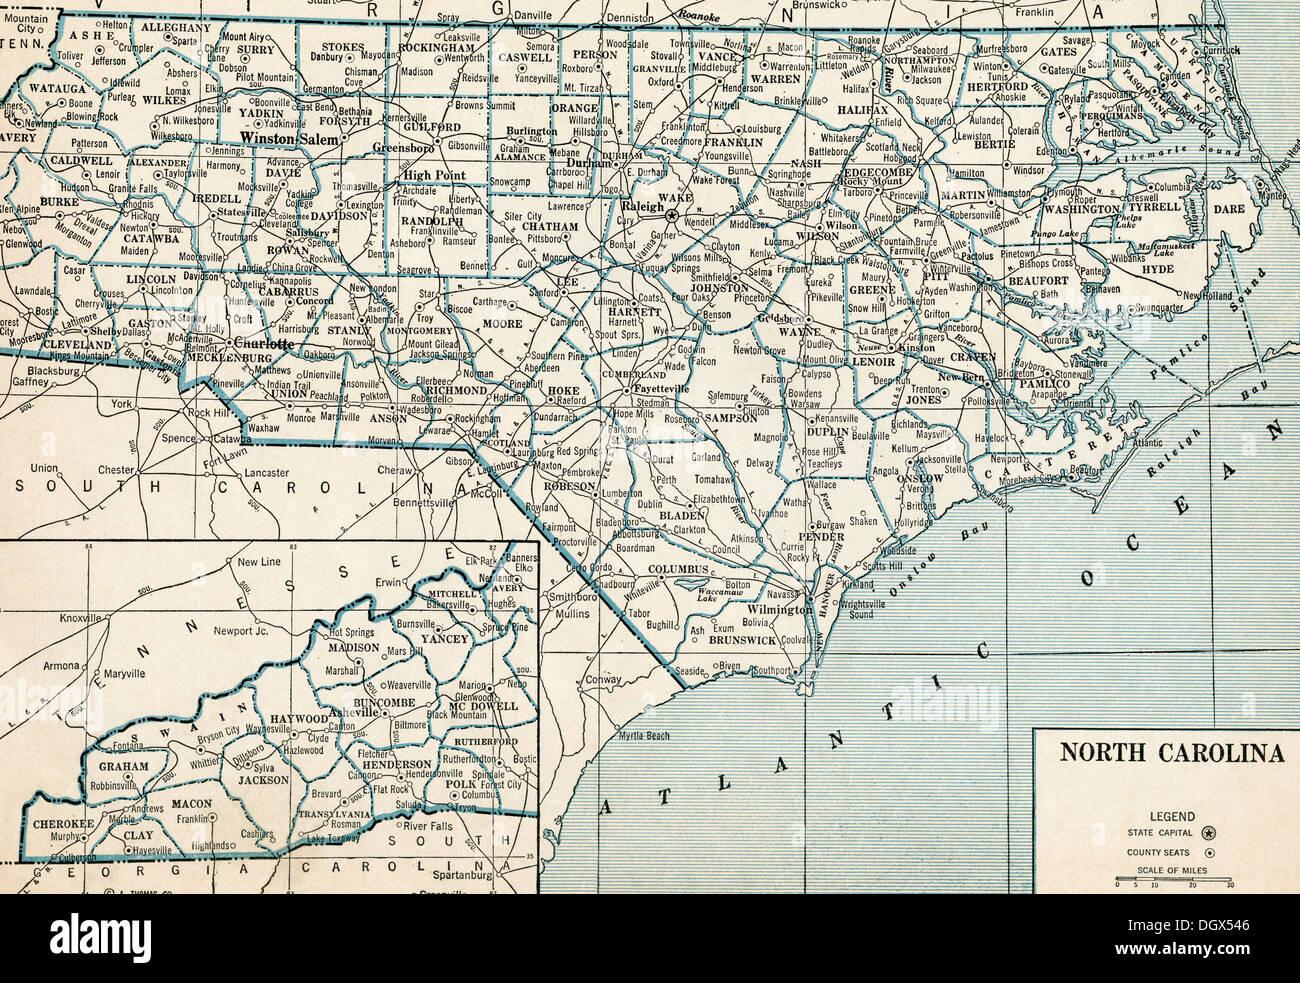 North Carolina State Map Stockfotos & North Carolina State Map ...